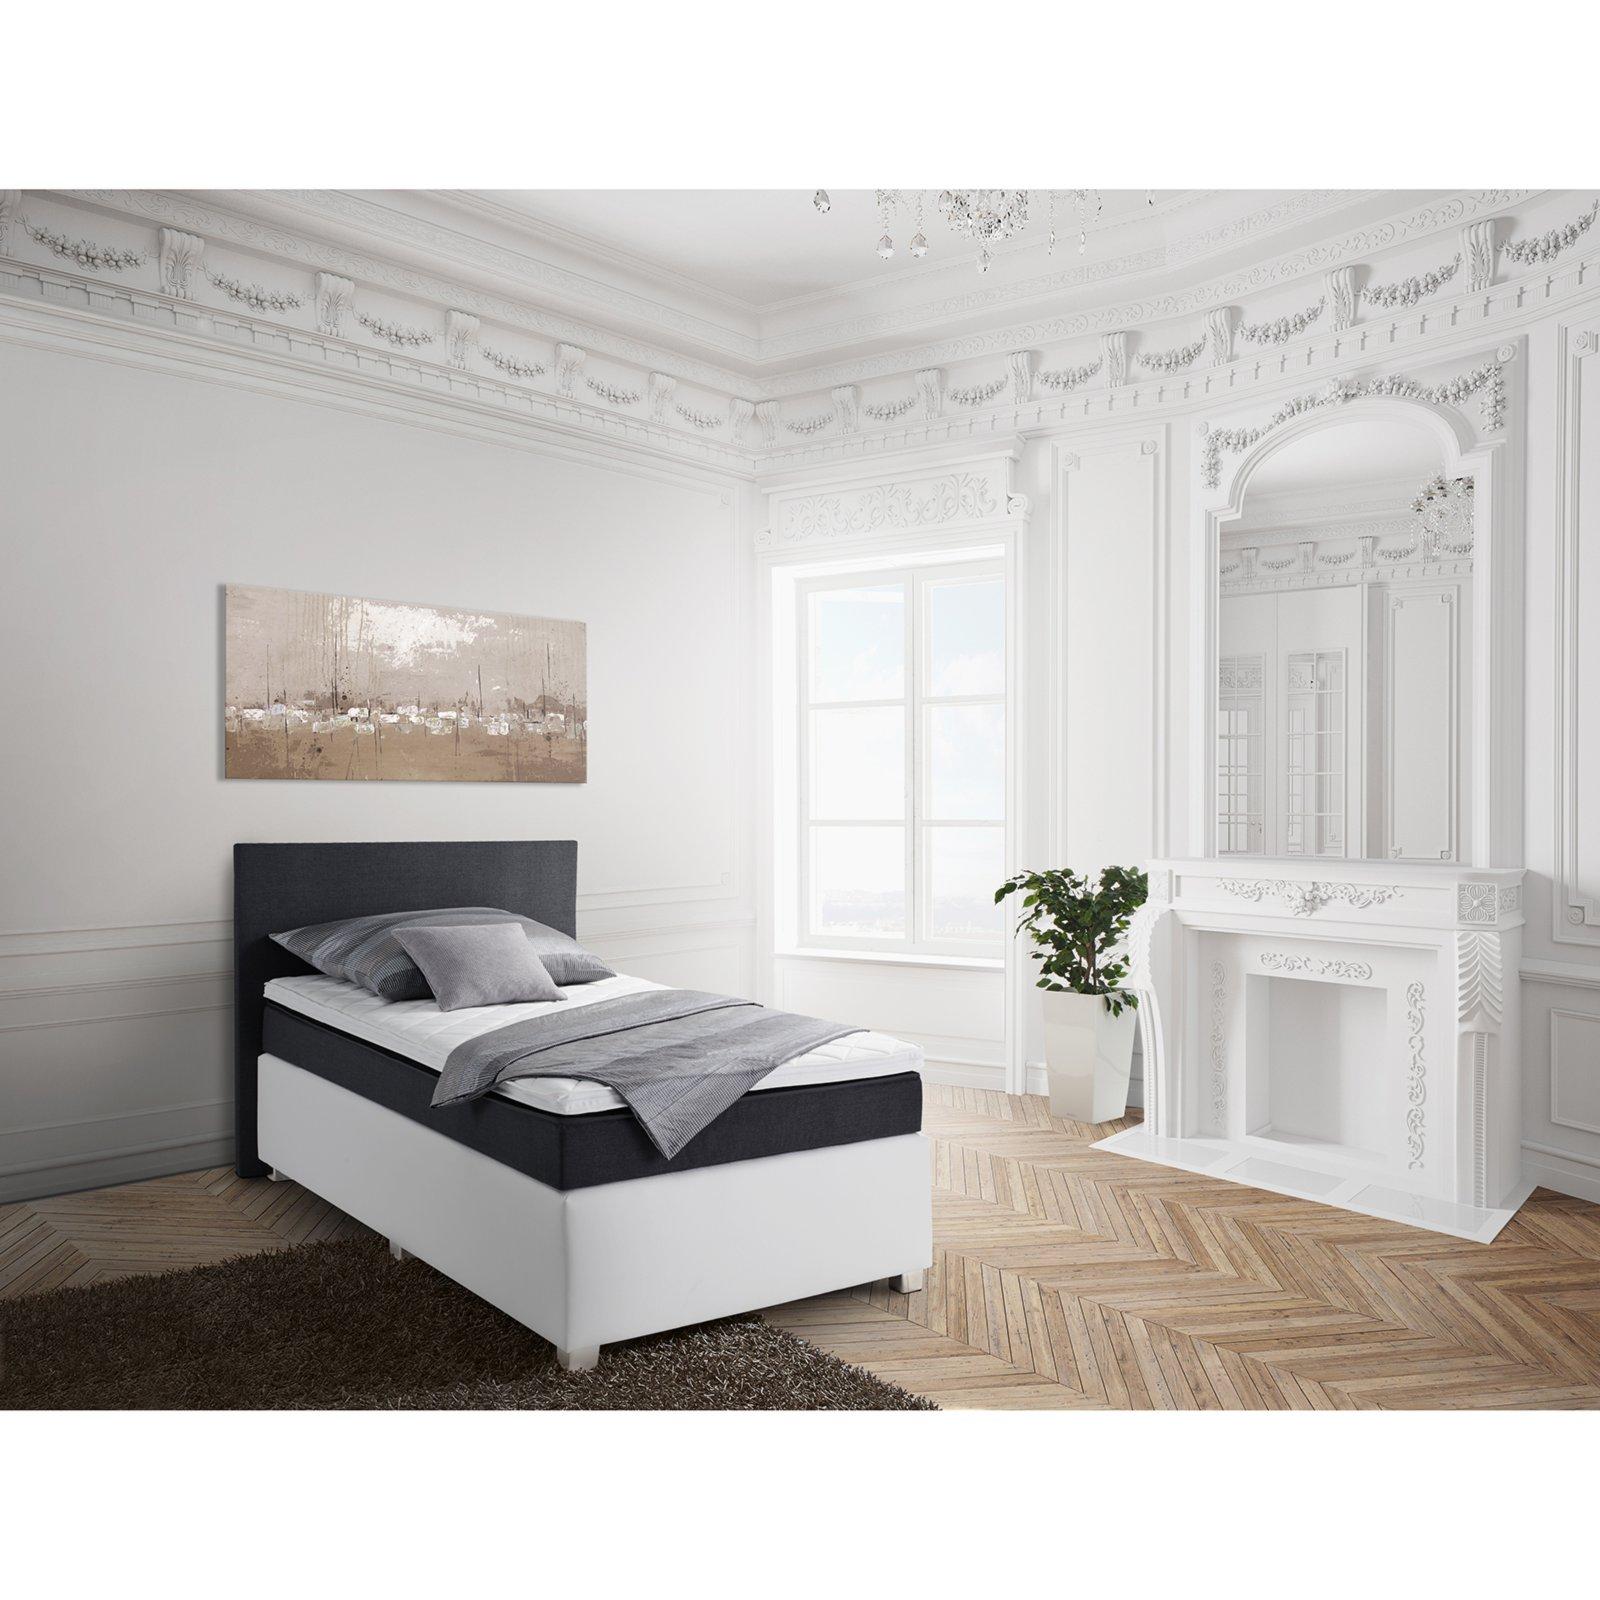 boxspringbett frederik wei anthrazit bonell federkern 100x200 cm ebay. Black Bedroom Furniture Sets. Home Design Ideas